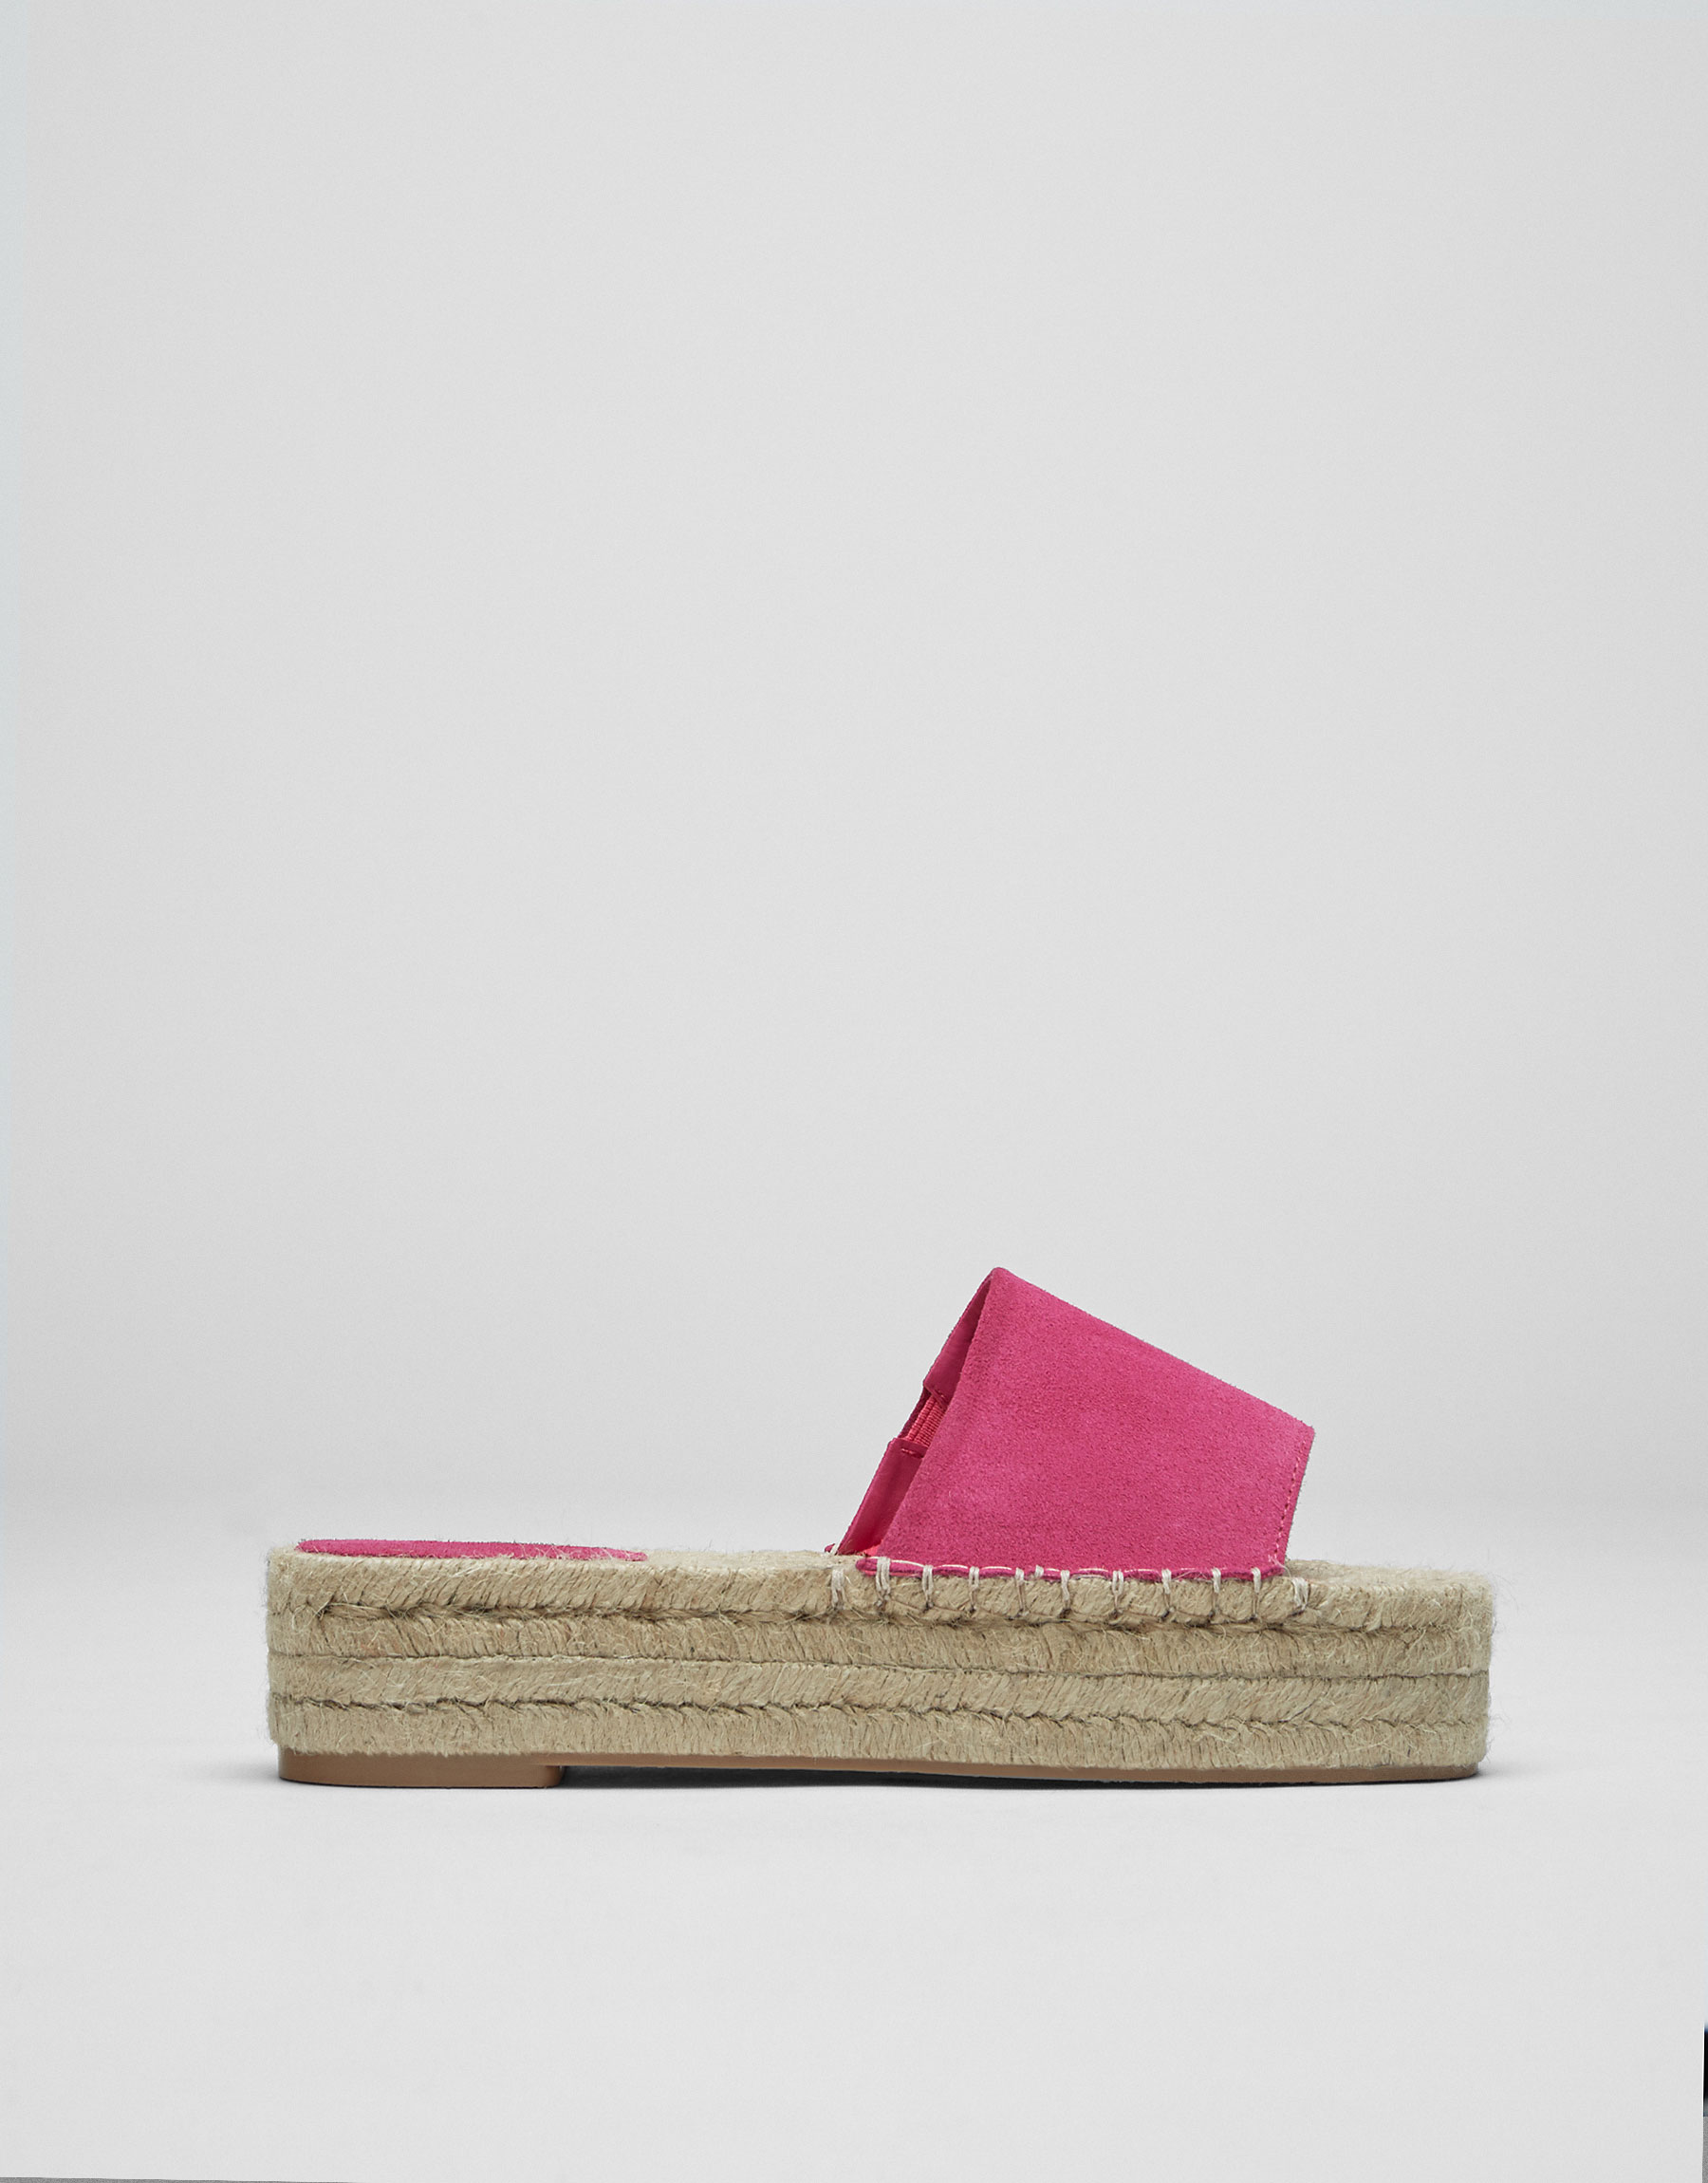 Sandália de juta colorida